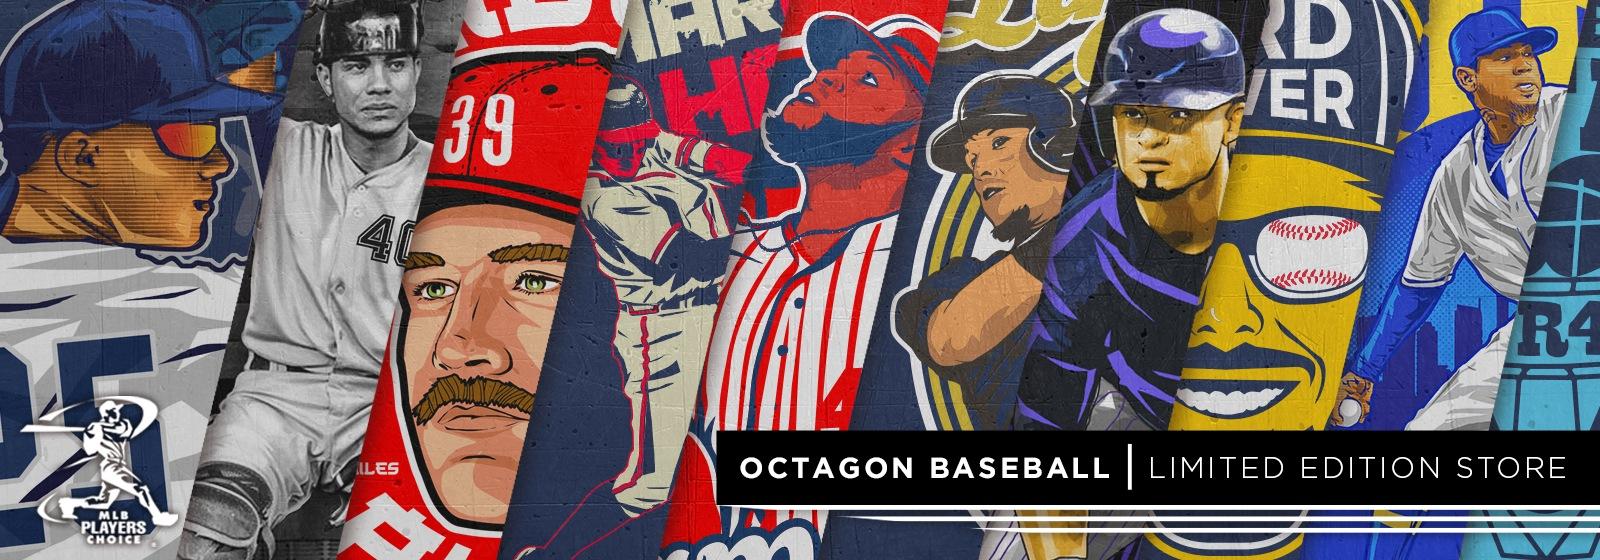 Octagon Baseball Store Store